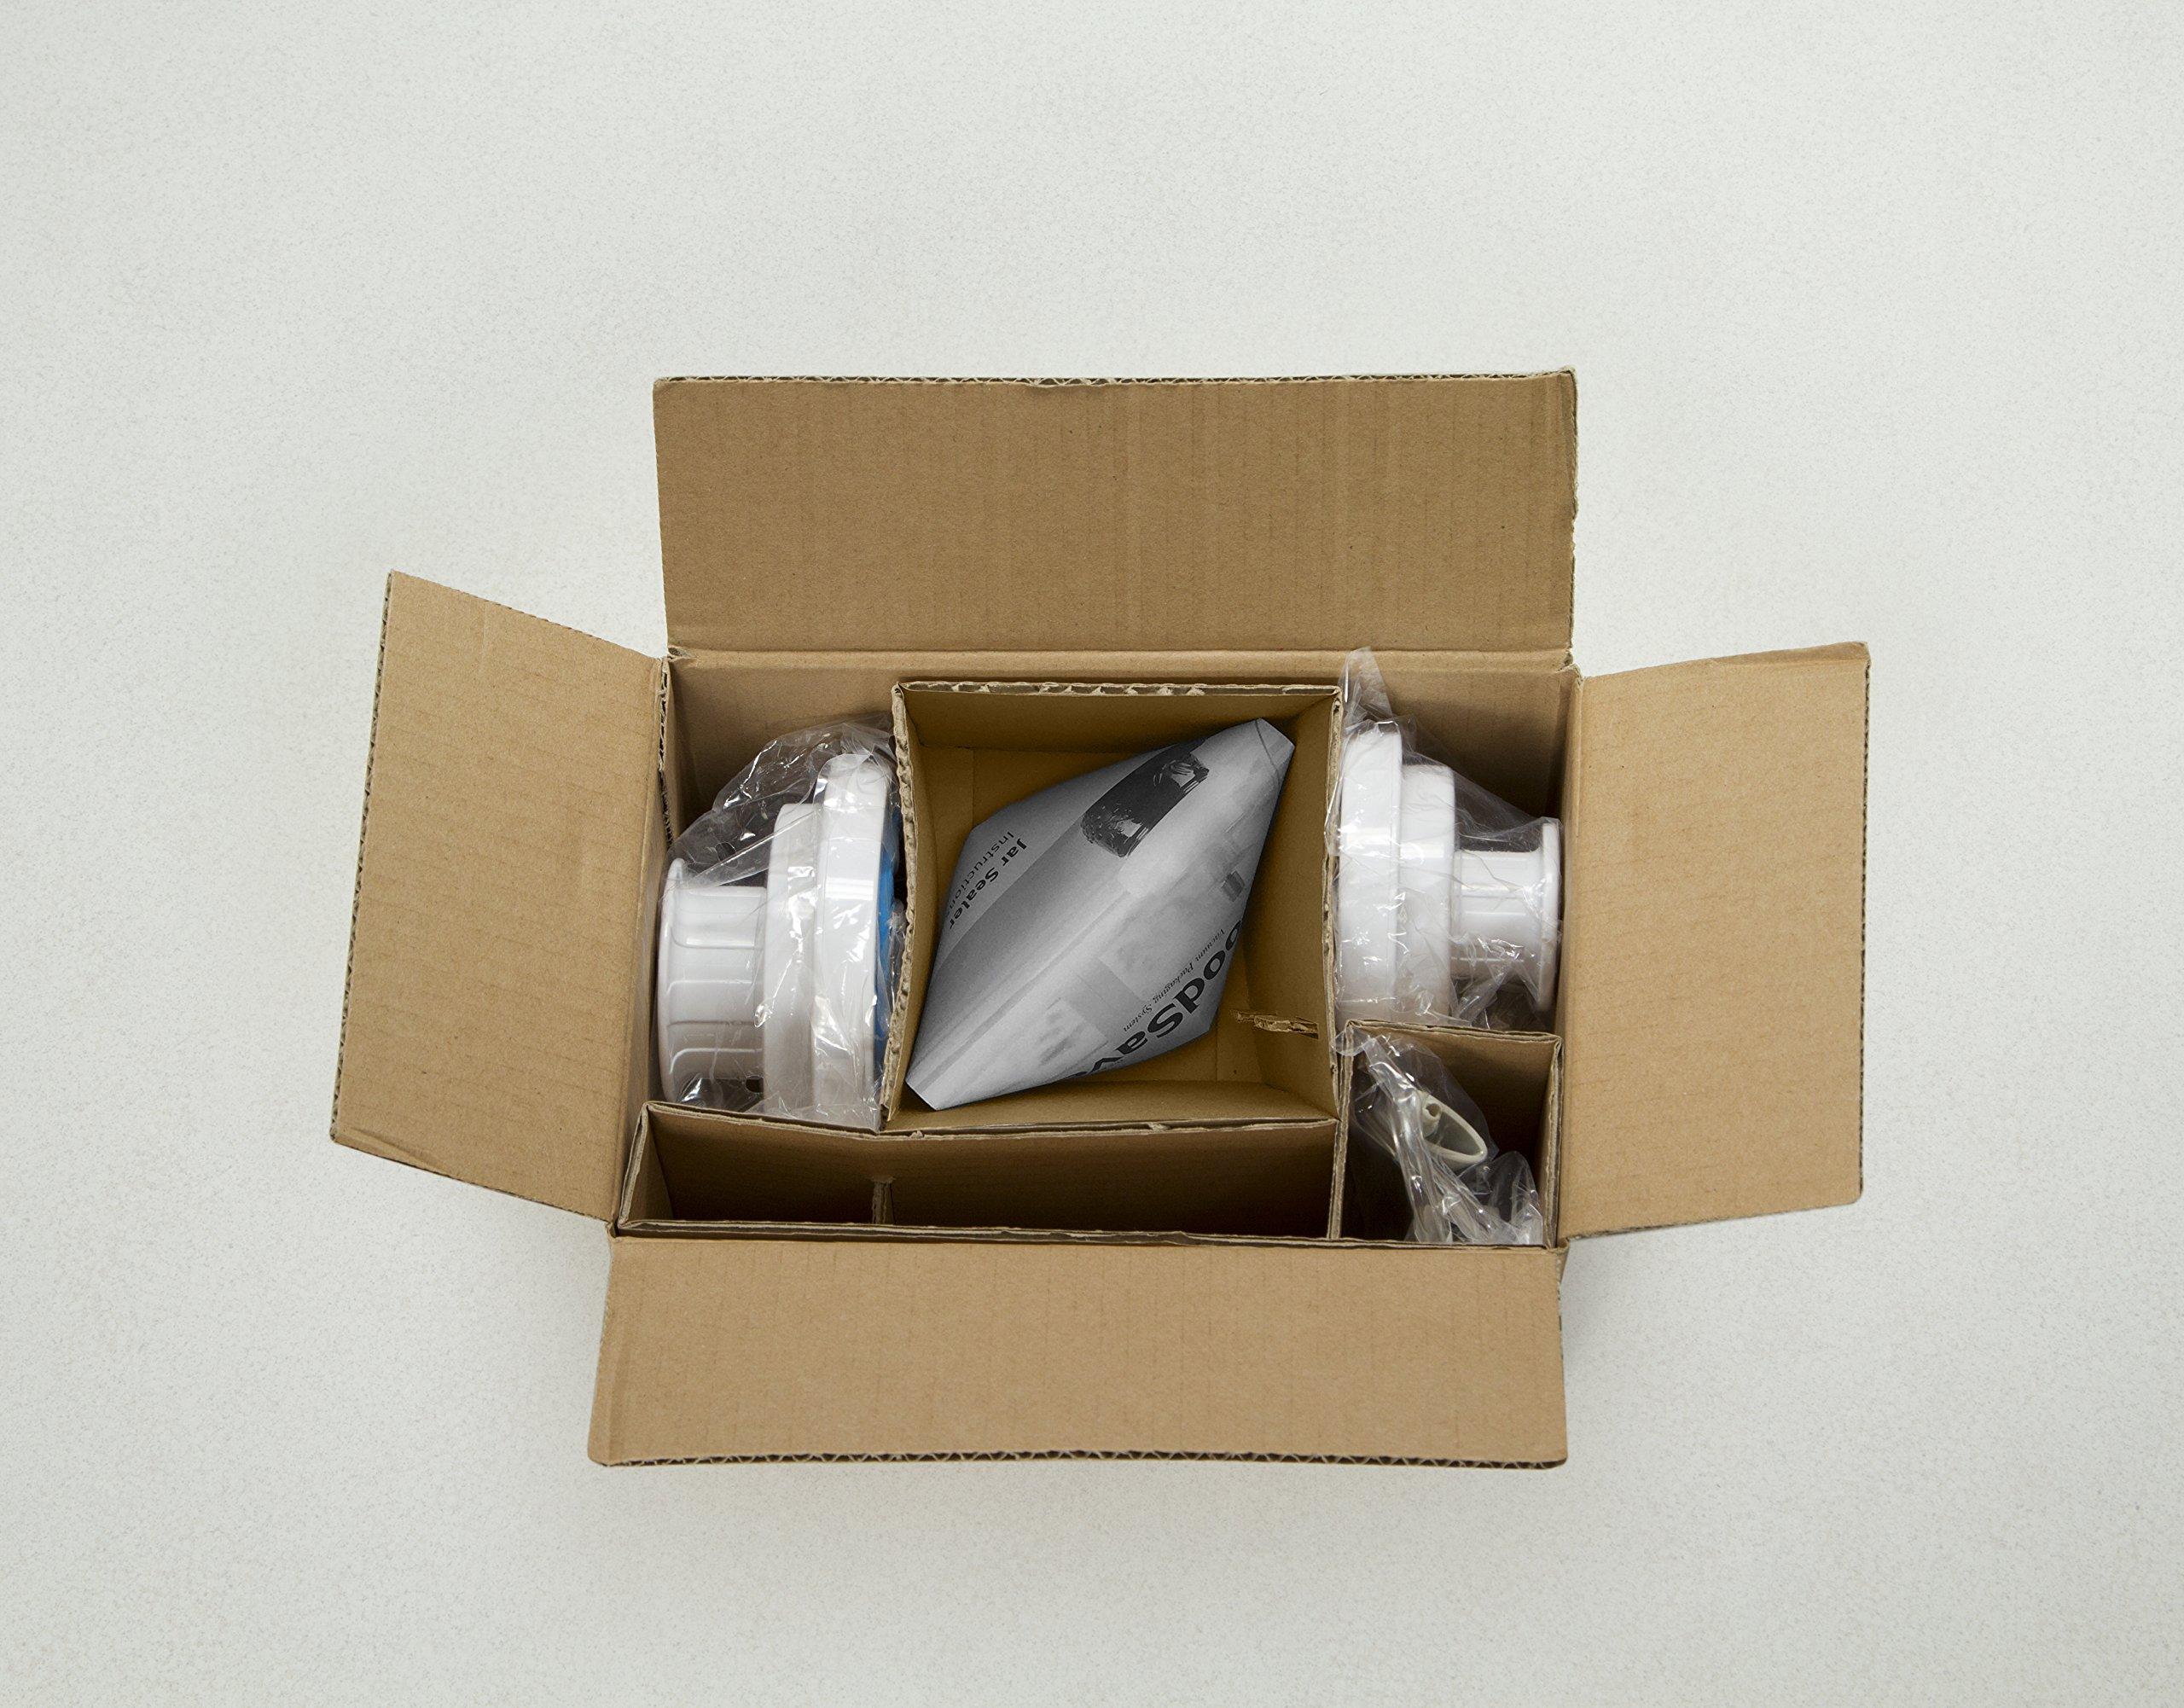 FoodSaver Vacuum Sealer FCARWJAH-000 Wide-Mouth Jar Kit with Regular Sealer and Accessory Hose, White by FoodSaver (Image #4)